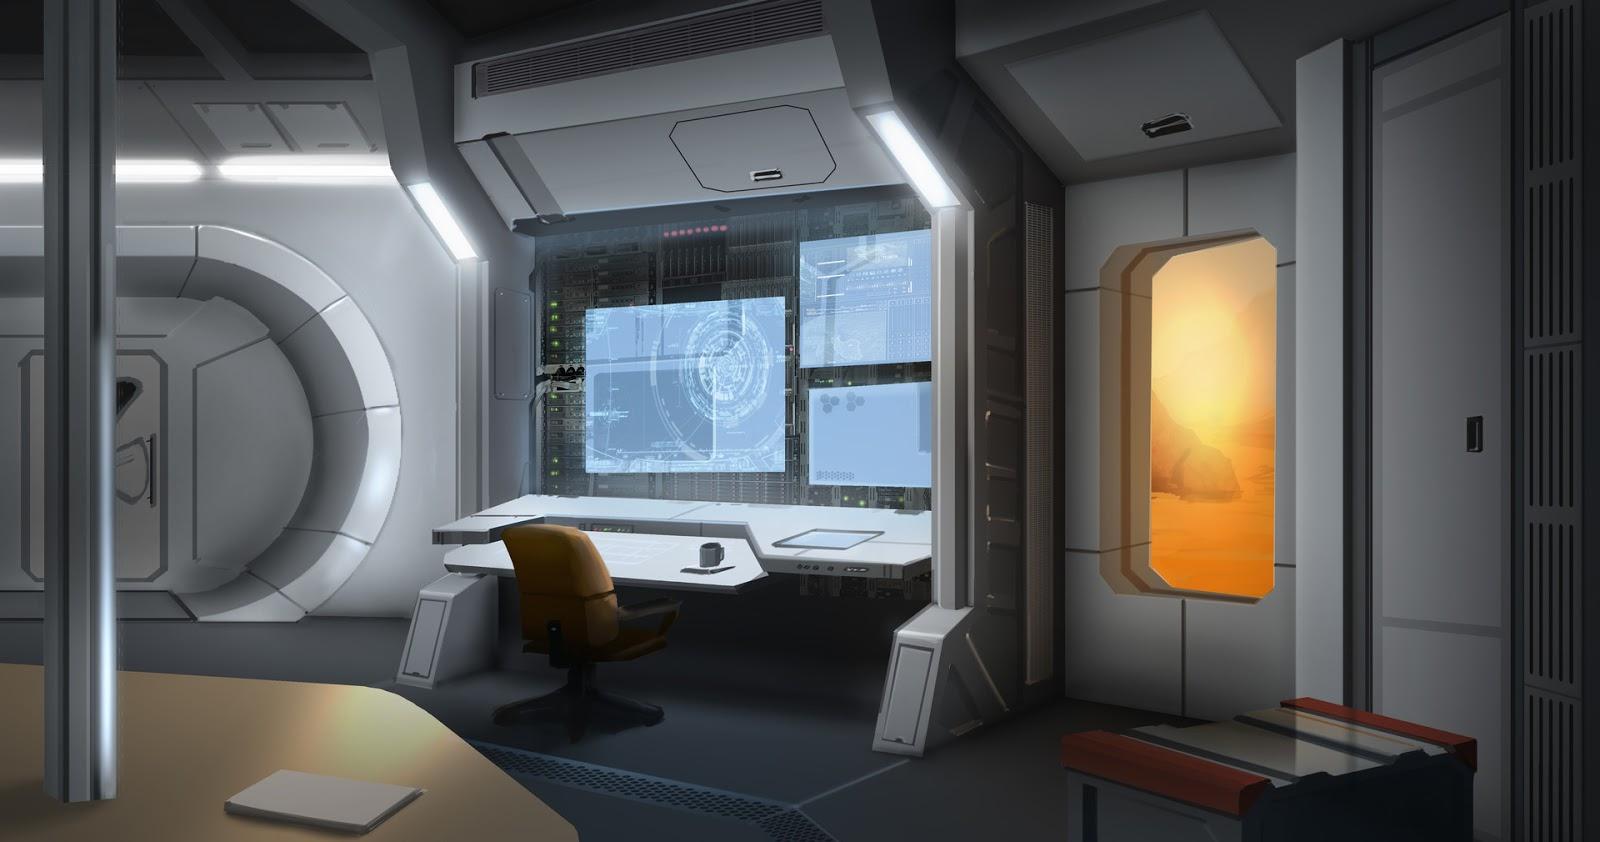 Mars base interior by Alexey Rubakin